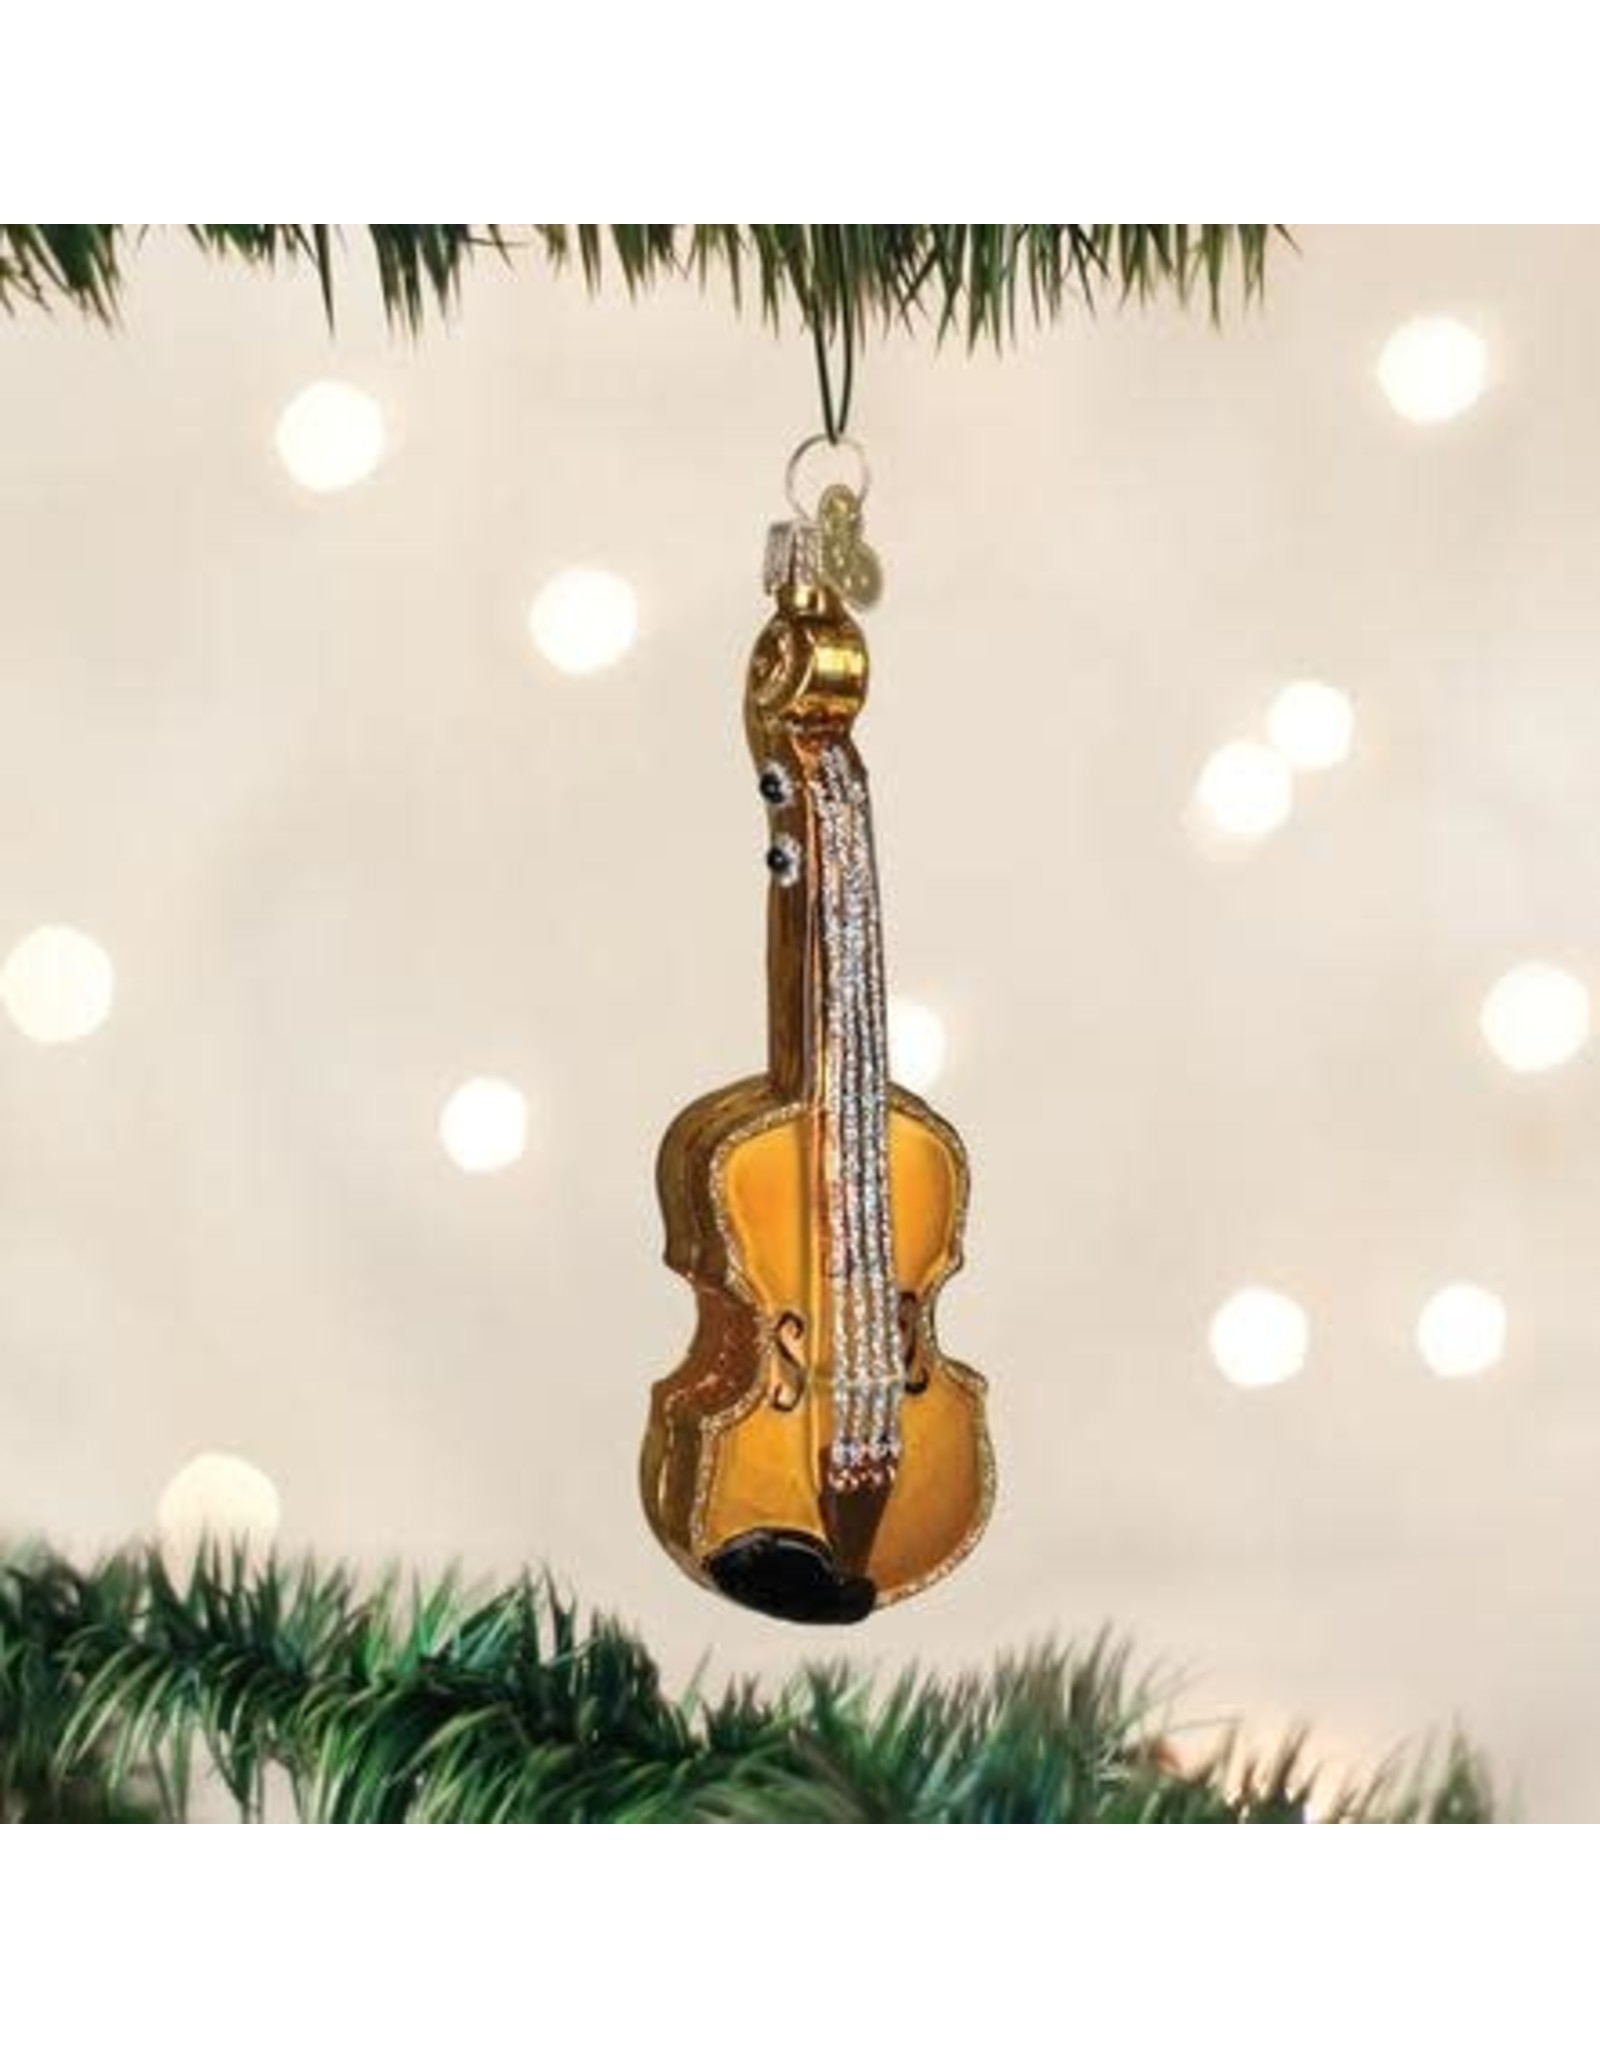 Violin Ornament